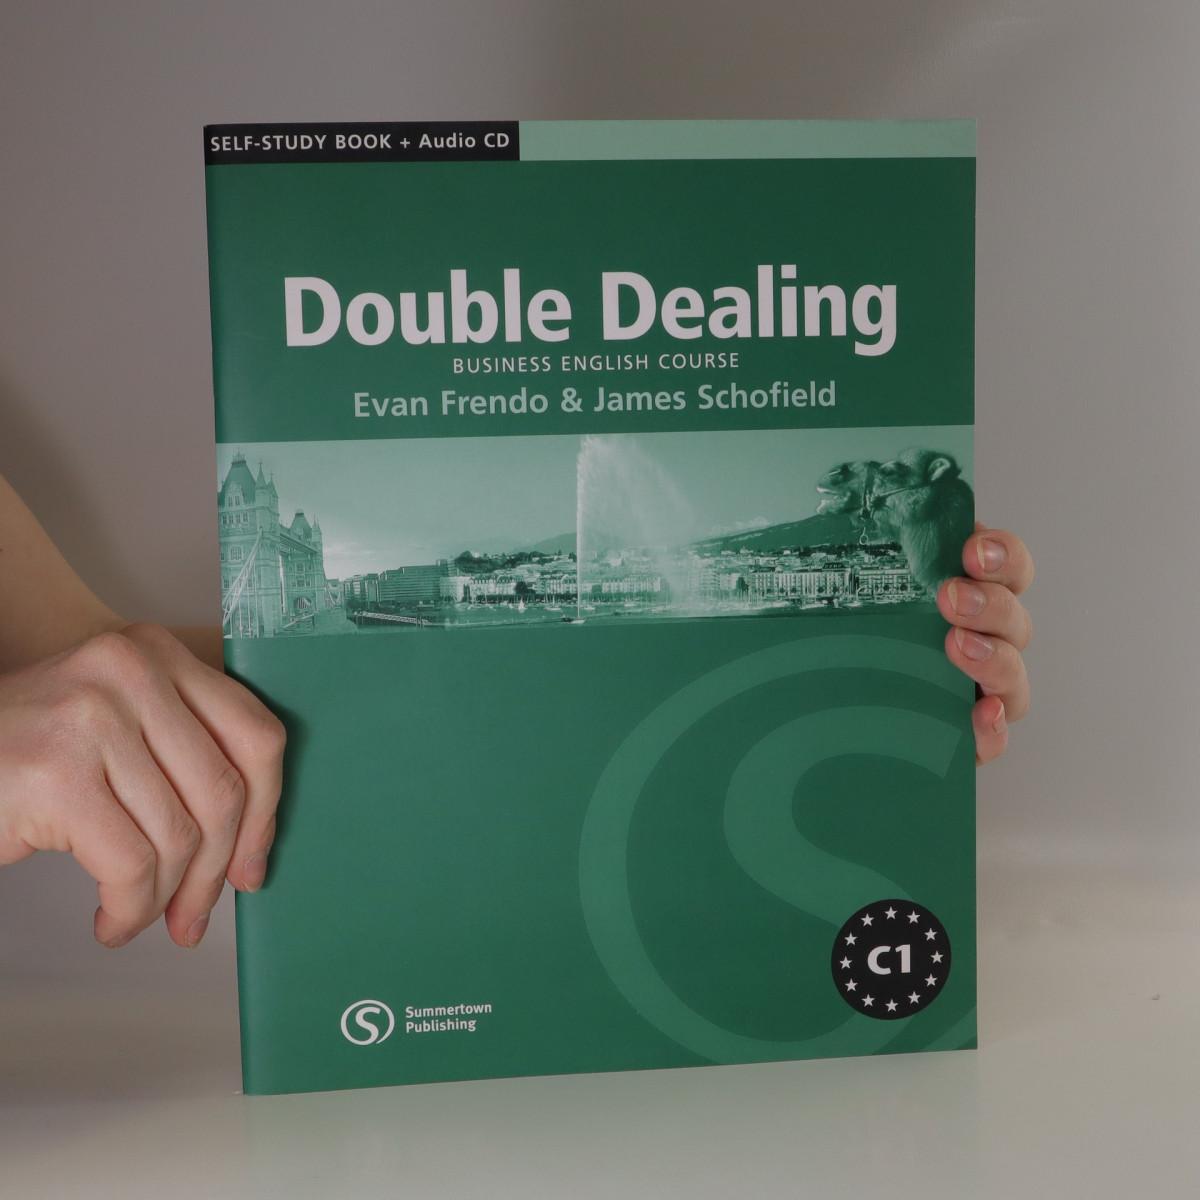 antikvární kniha Double Dealing. C1. Business English Course. Self-study Book, Audio CD., 2006